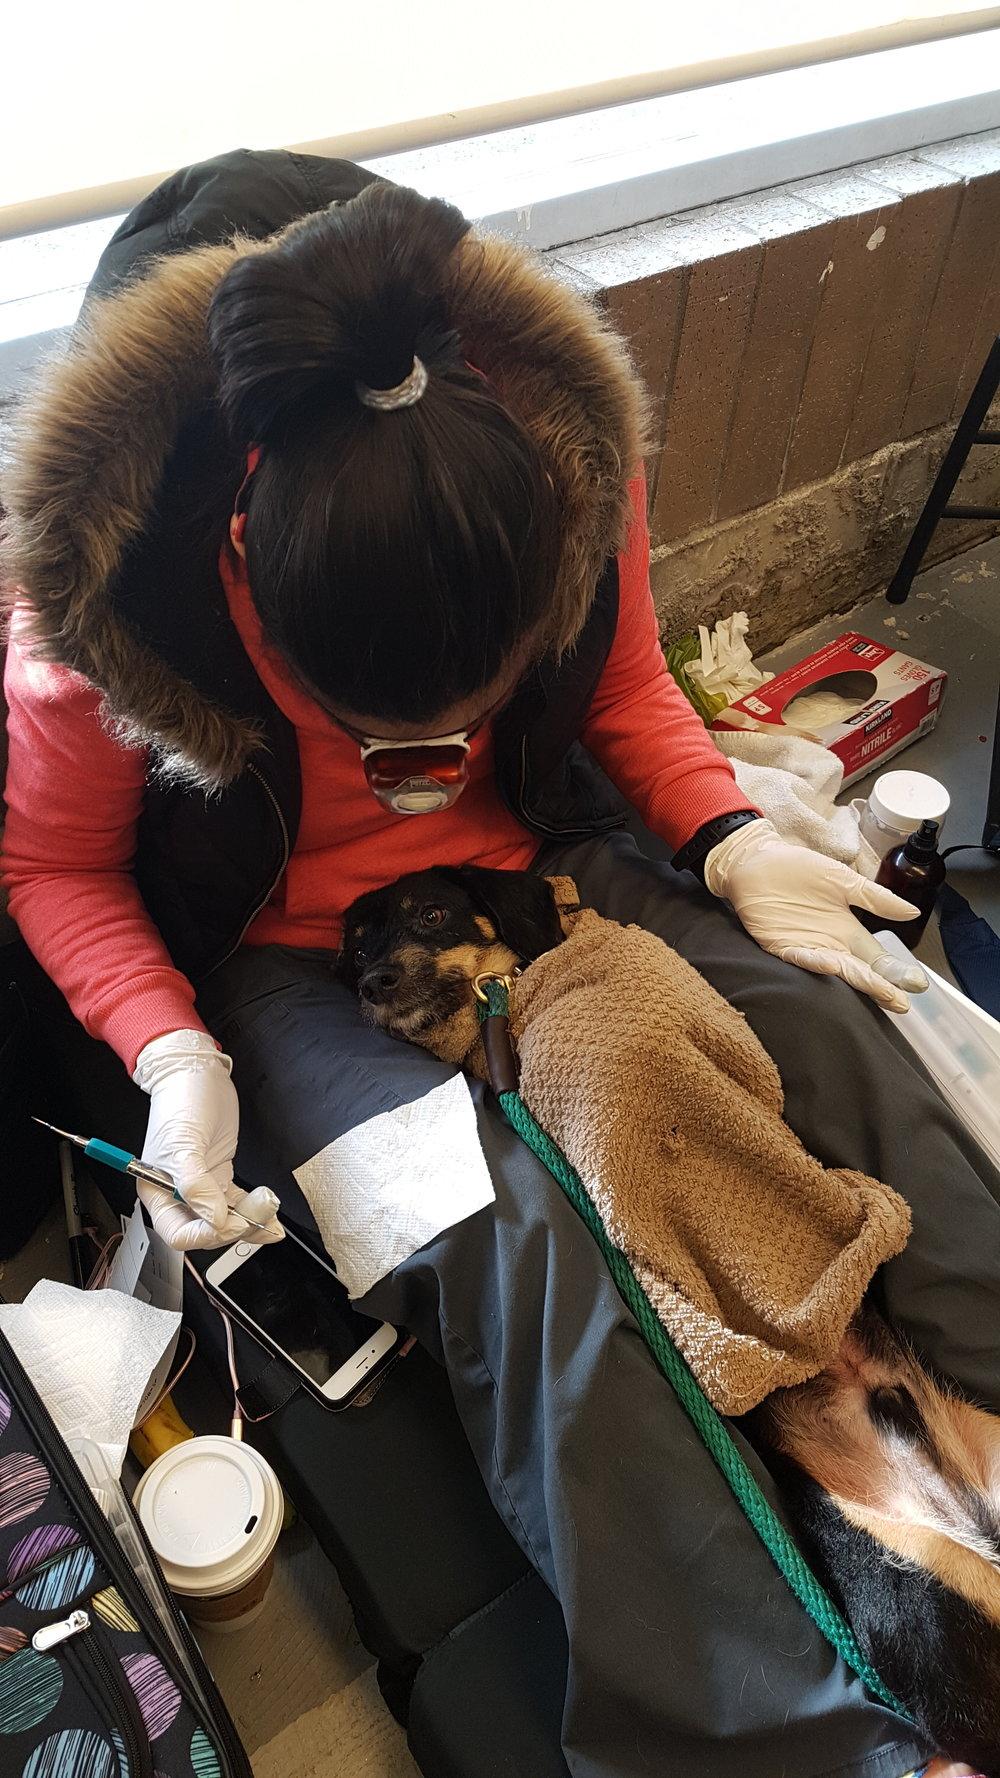 Bonzo relaxing at the dentist (aka K9 Gentle Dental)